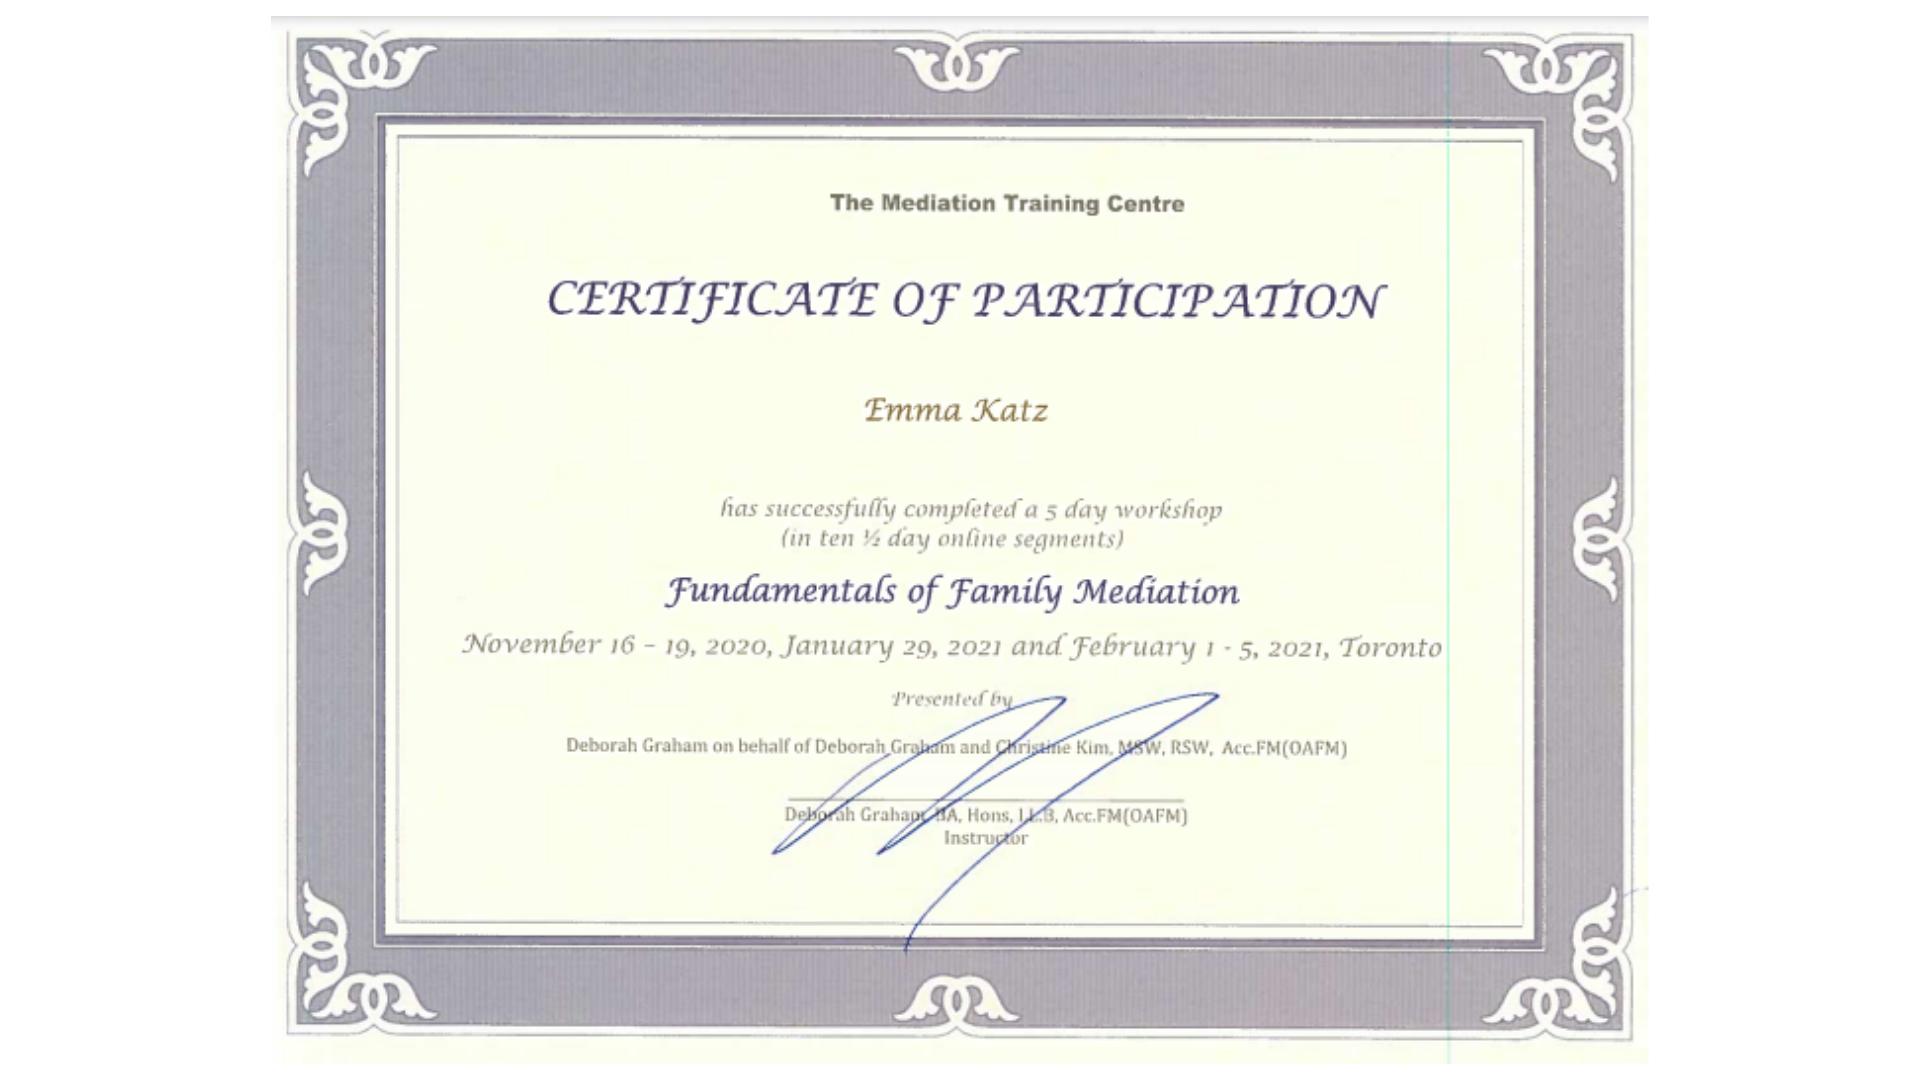 Family Mediation Certification for Emma Katz